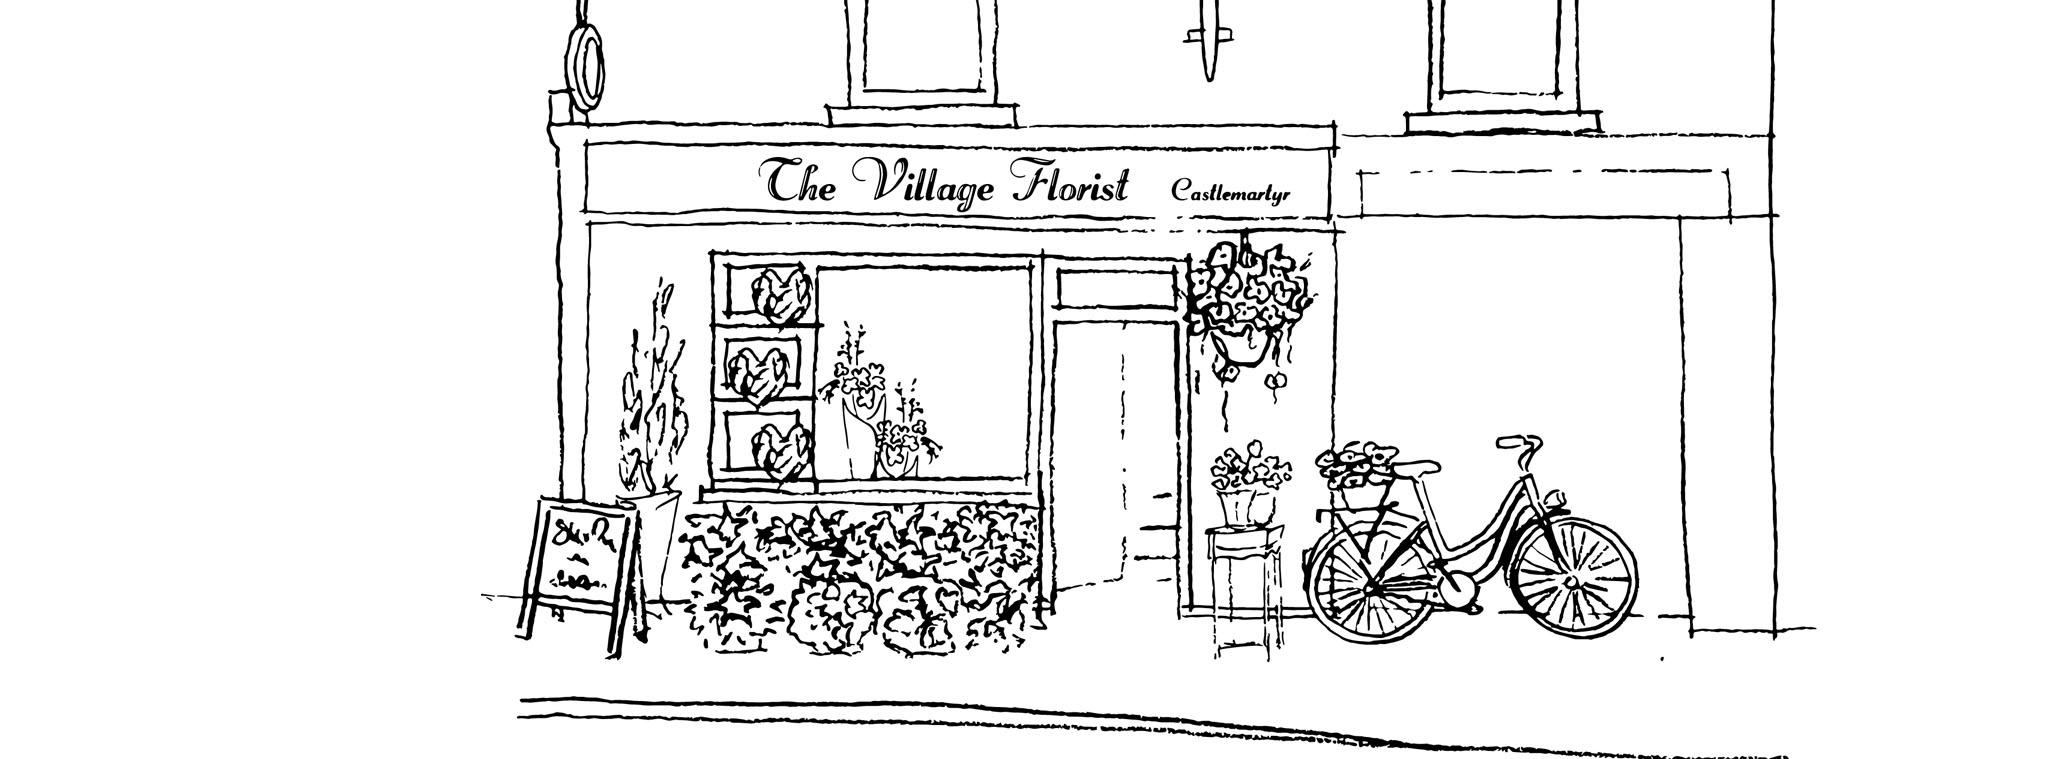 the_village_florist_castlemartyr_shop.jpg